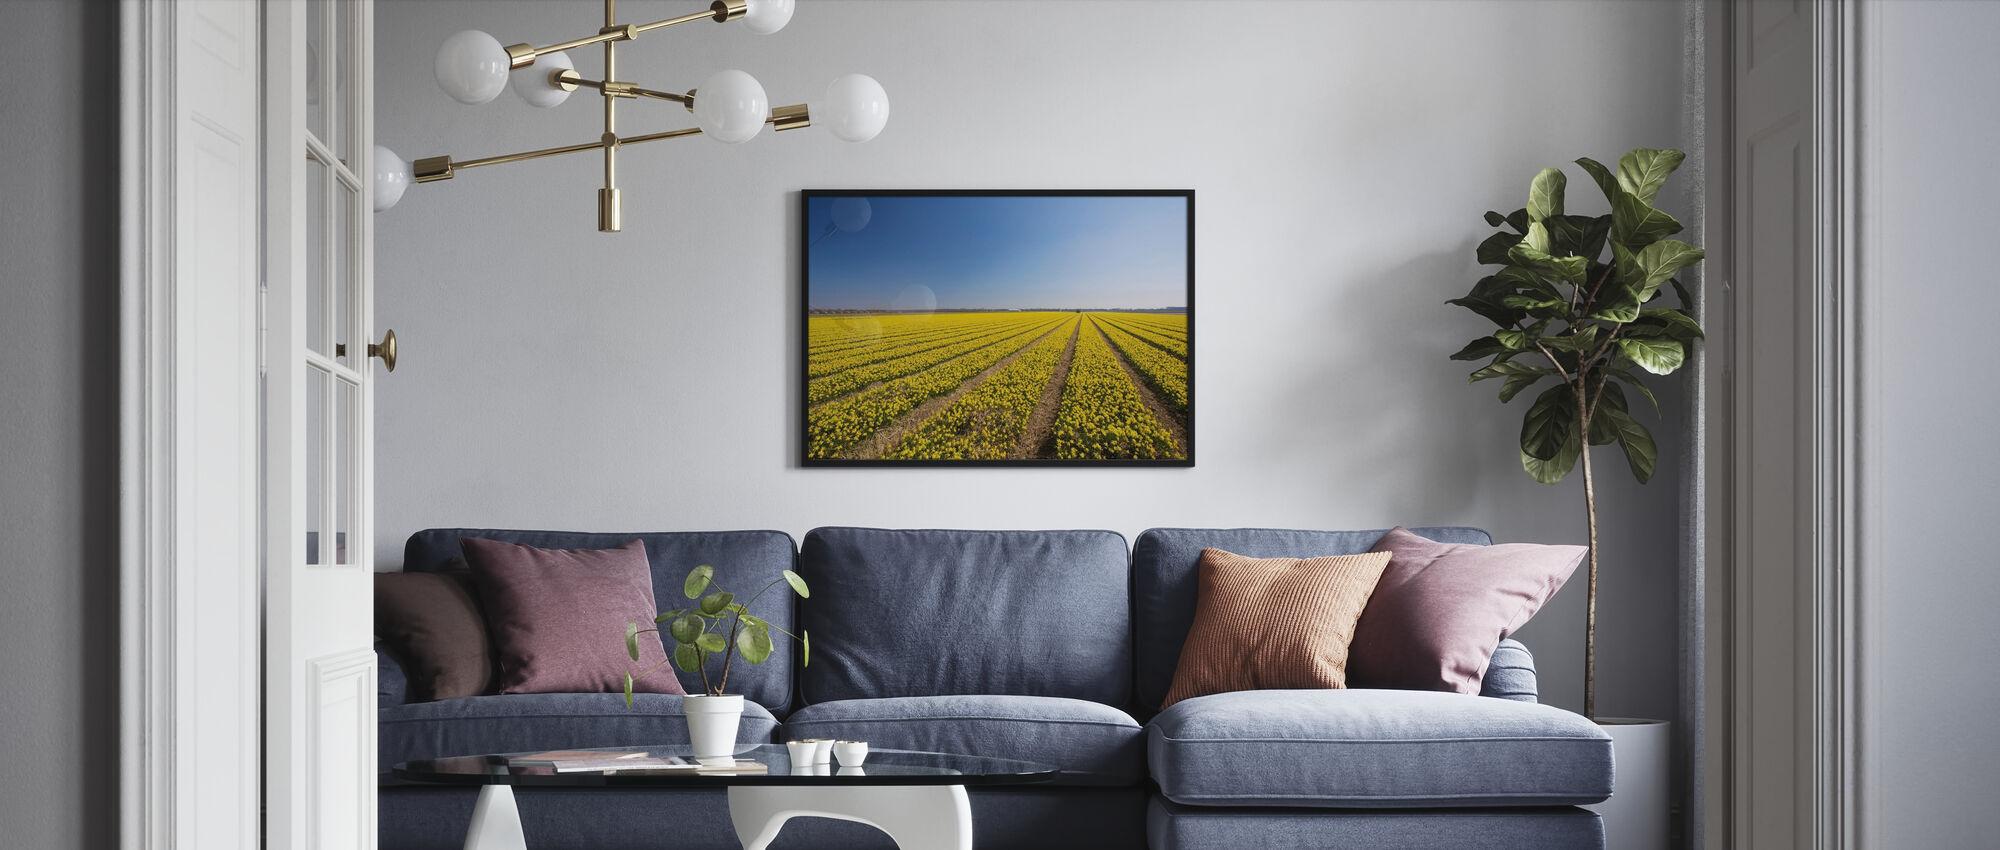 Infinite Growing - Poster - Living Room